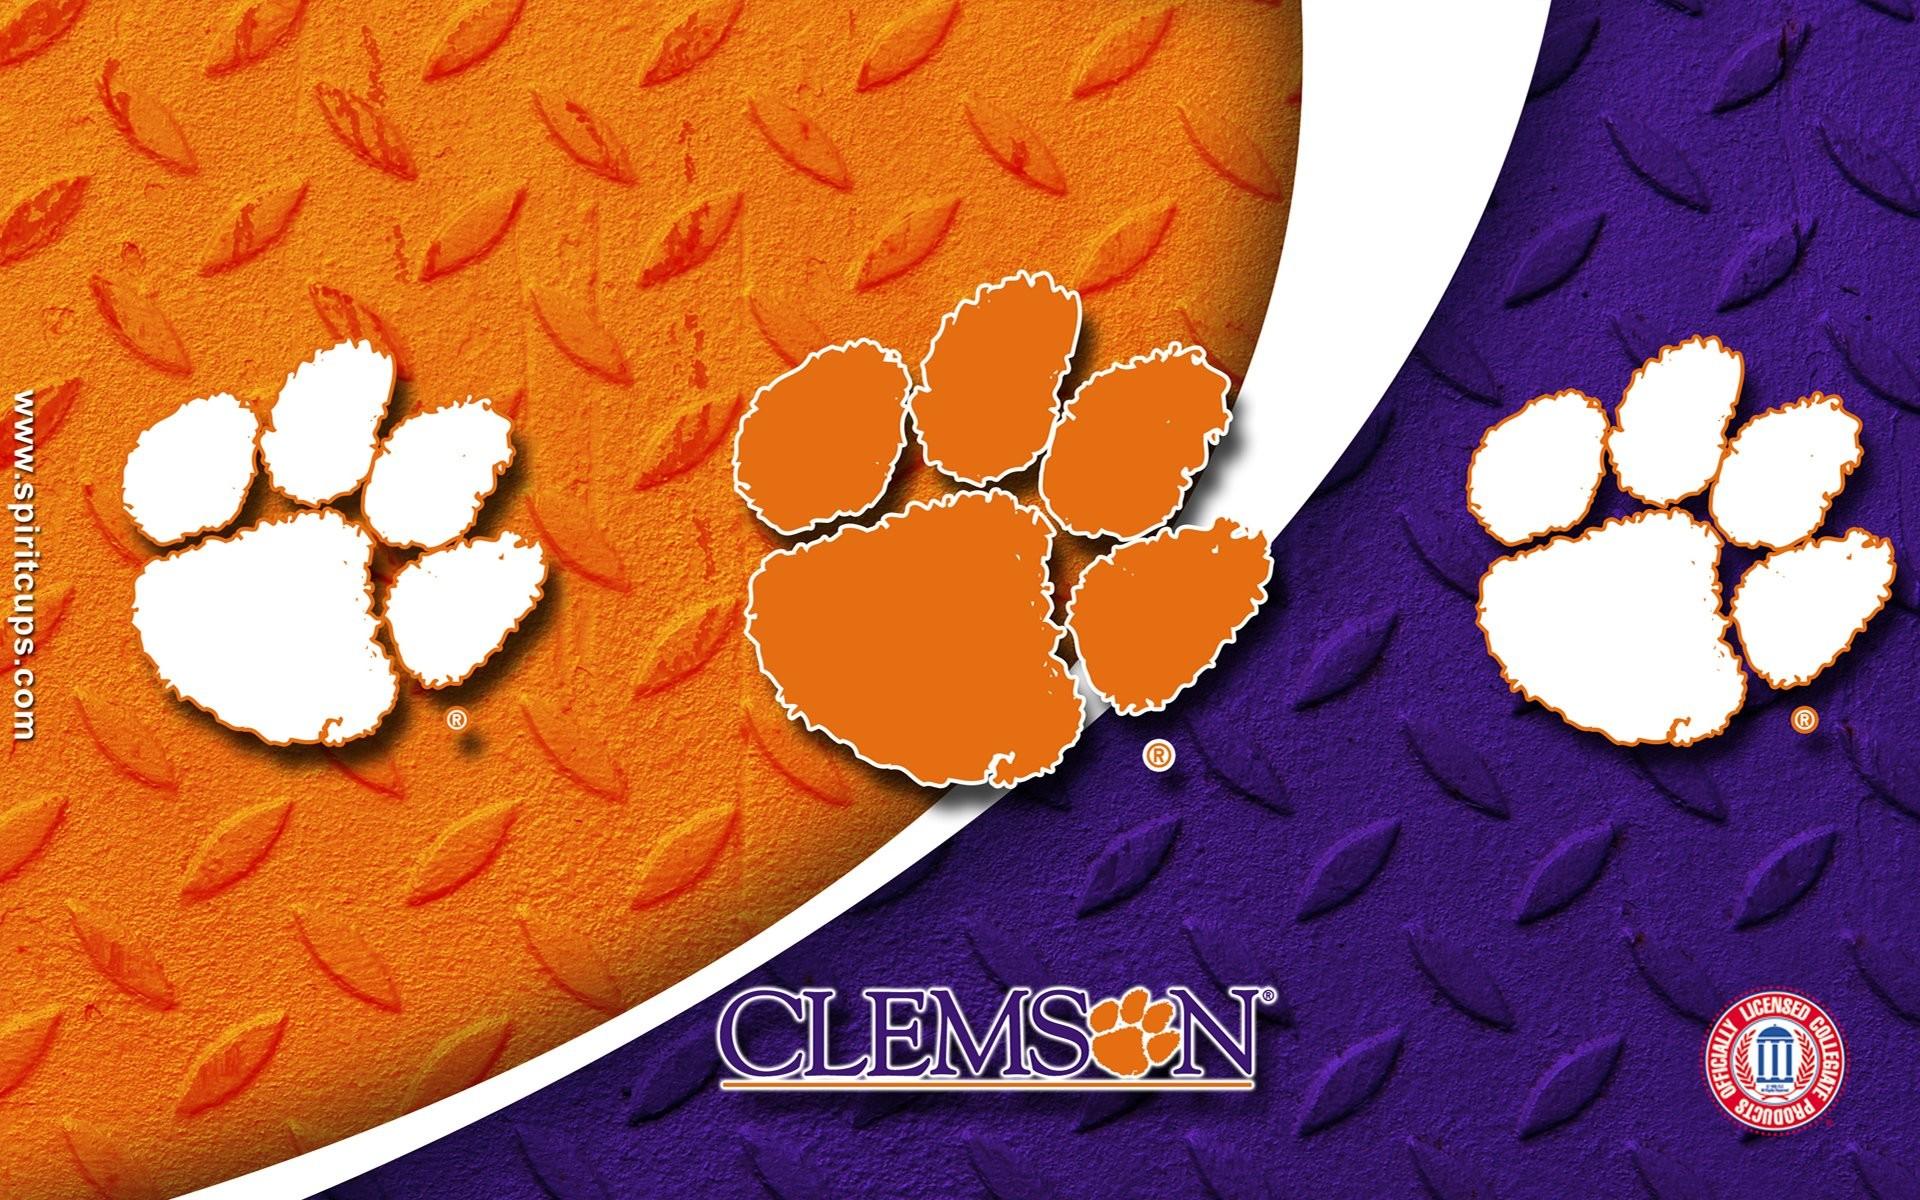 CLEMSON TIGERS college football wallpaper | | 593971 .